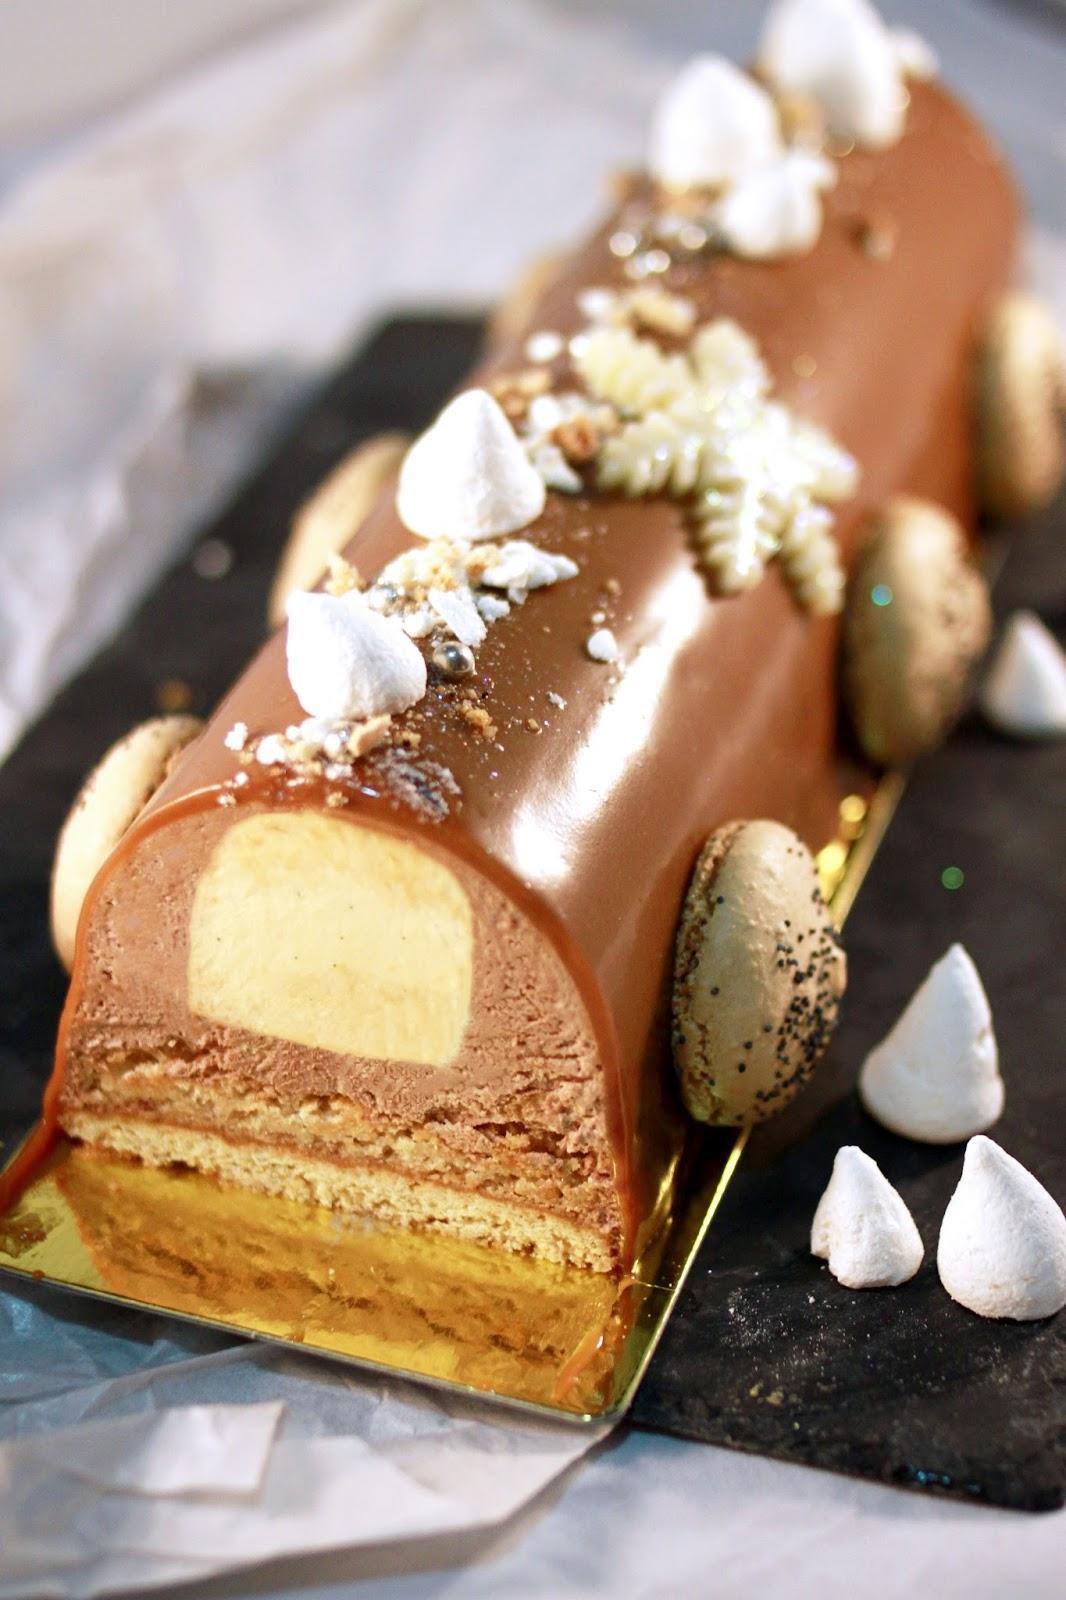 Recette buche de noel noisette chocolat caramel